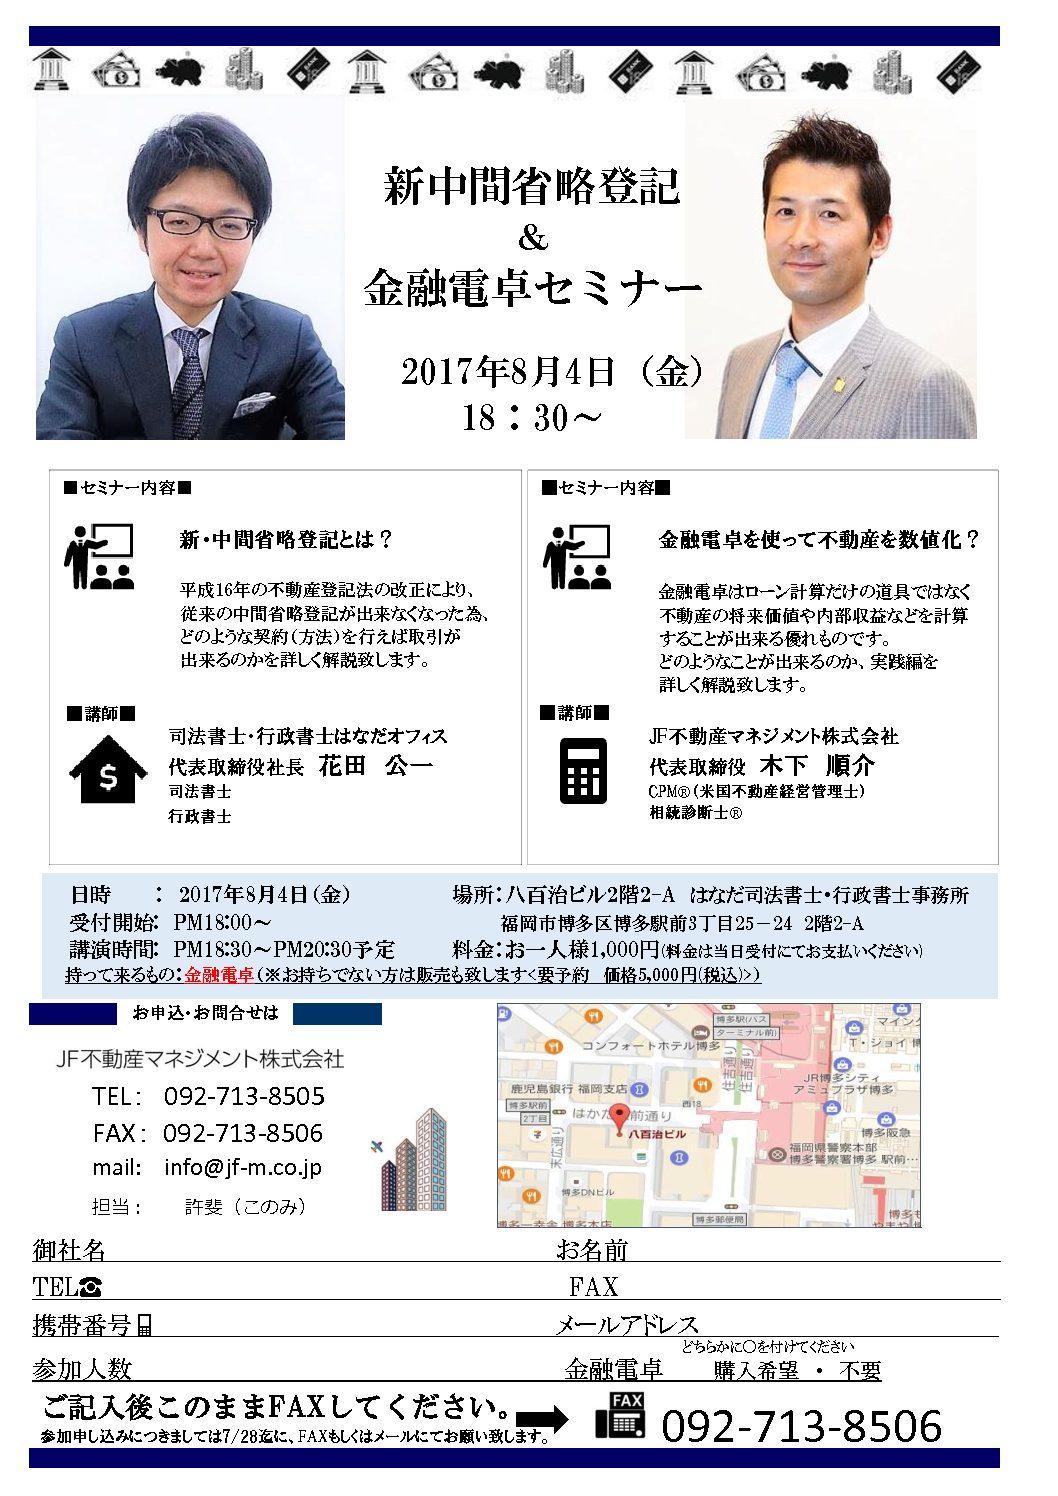 新中間省略登記&金融電卓セミナー開催